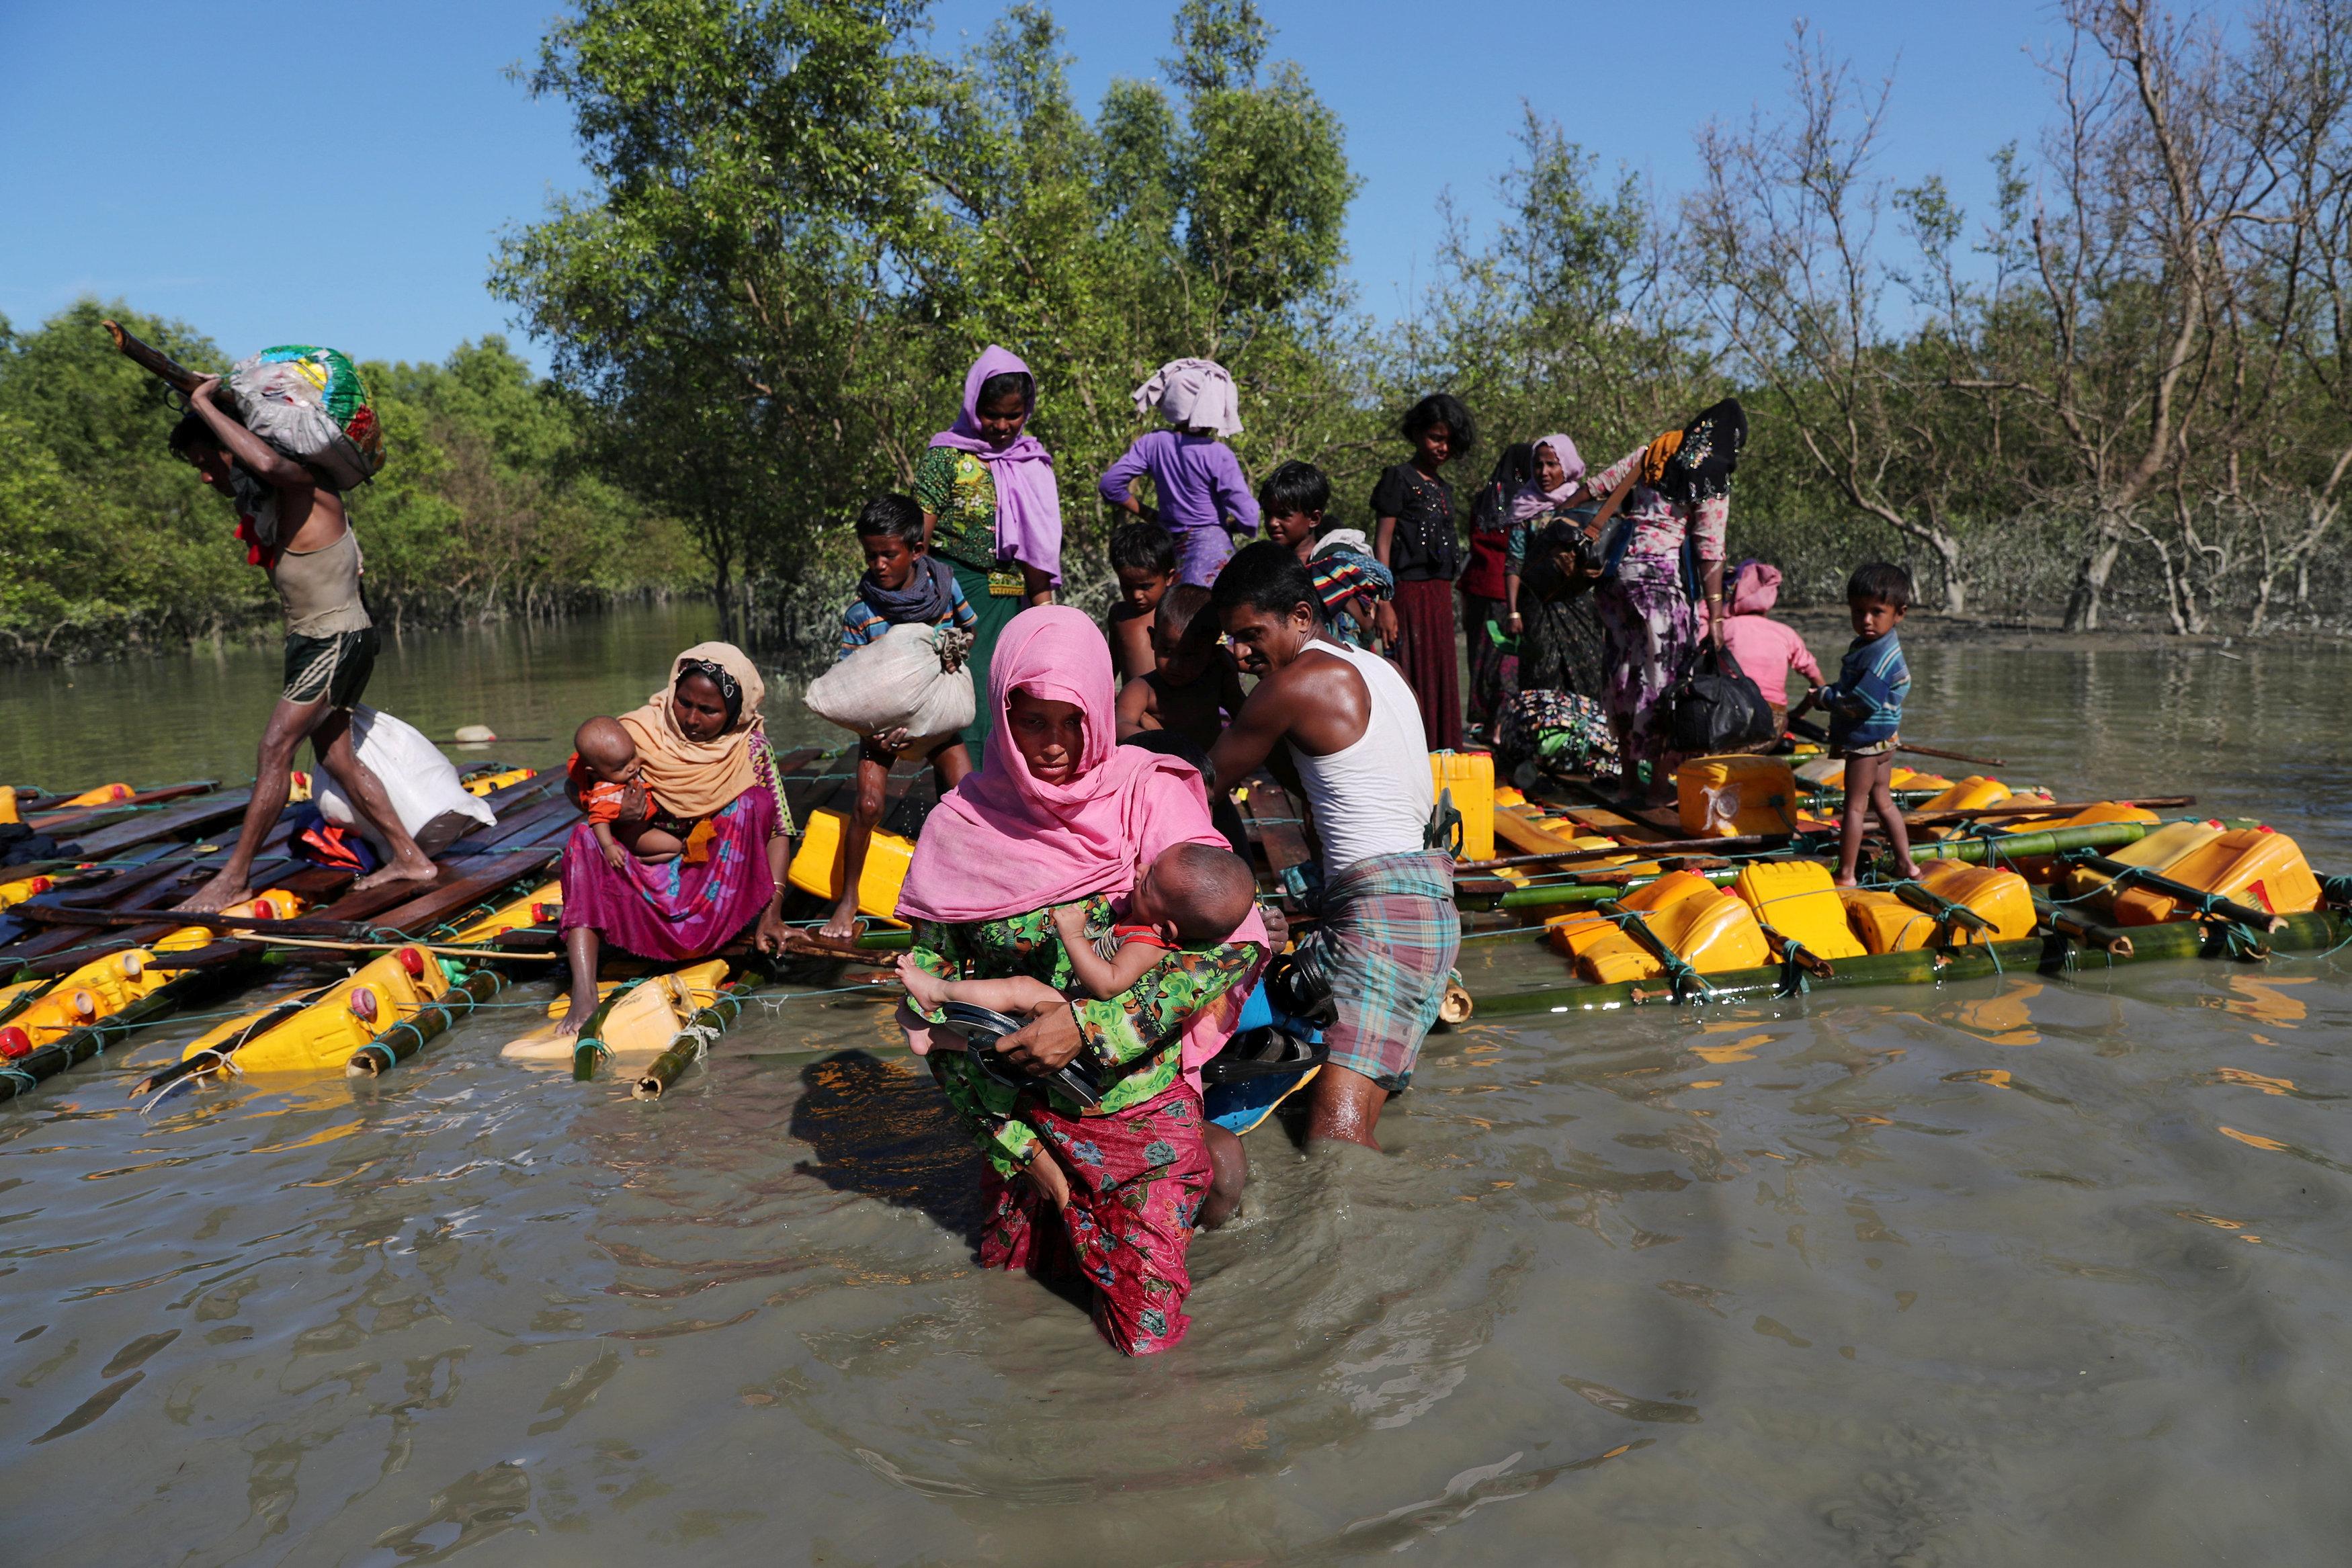 Aboard rickety boats or swimming, over 750 Rohingya reach Bangladesh